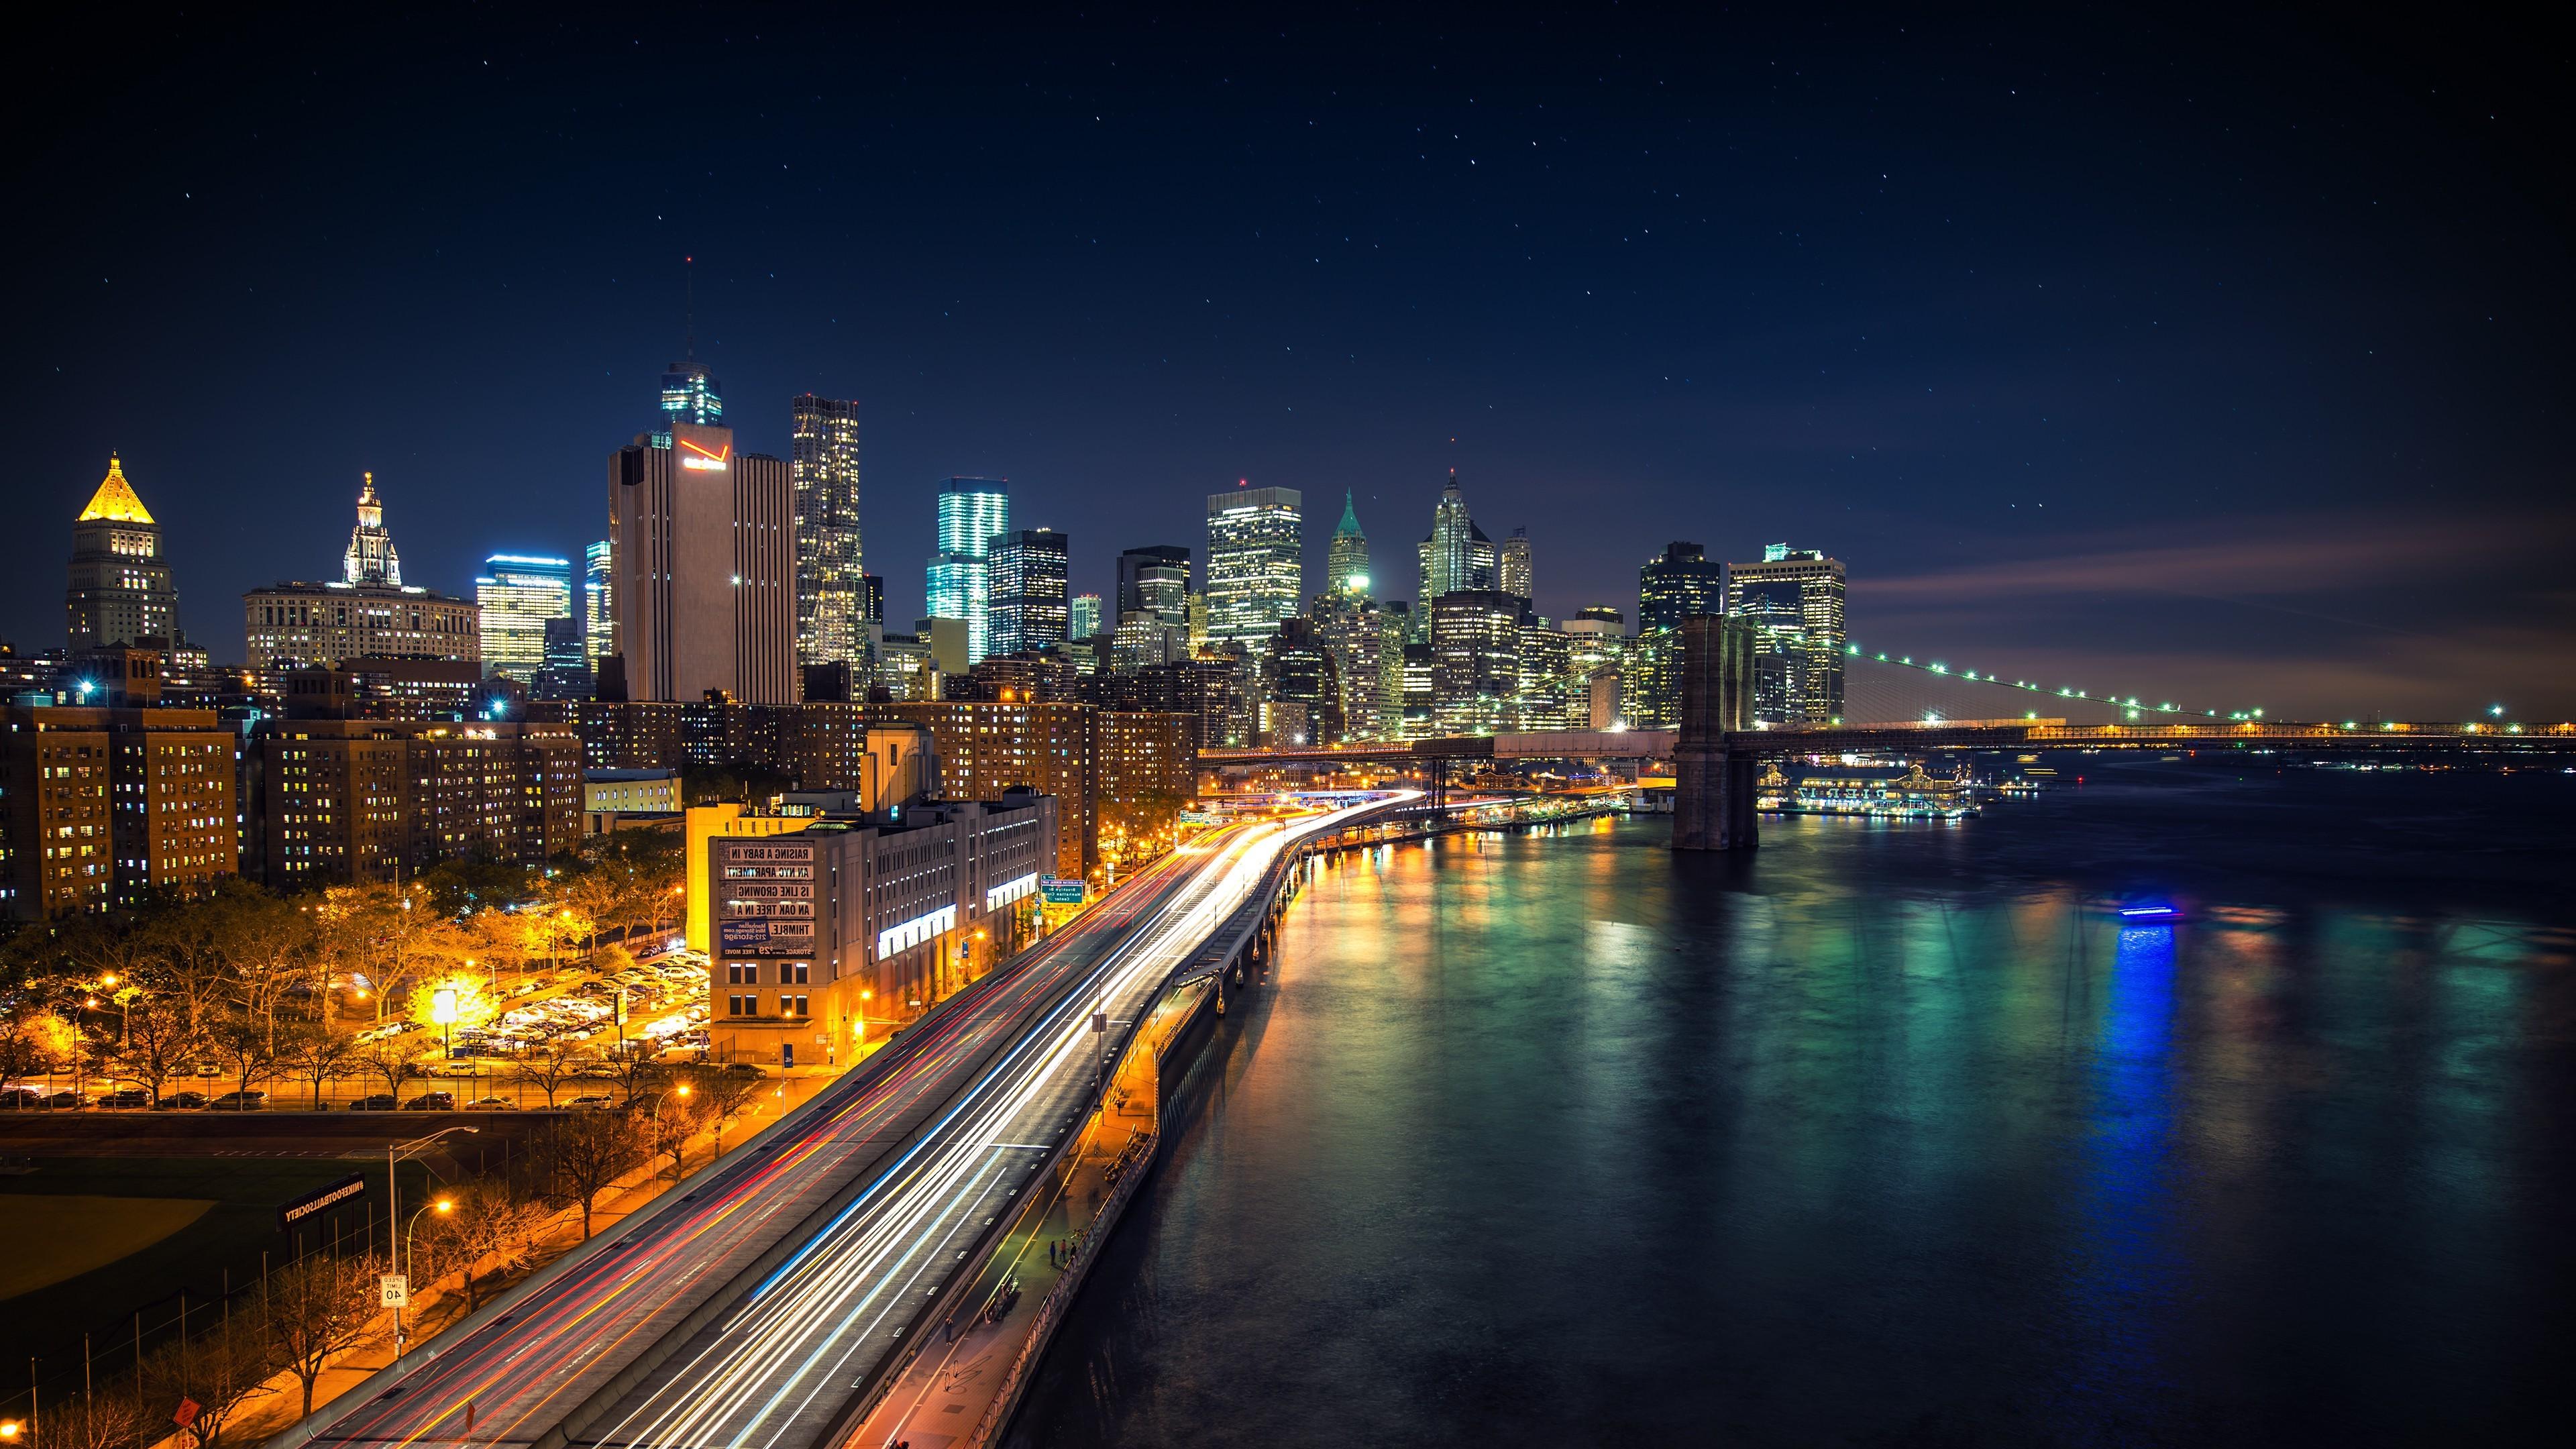 Wallpaper Lights City Cityscape Night Reflection Road Long Exposure Stars Skyline Skyscraper Evening Bridge Brooklyn River